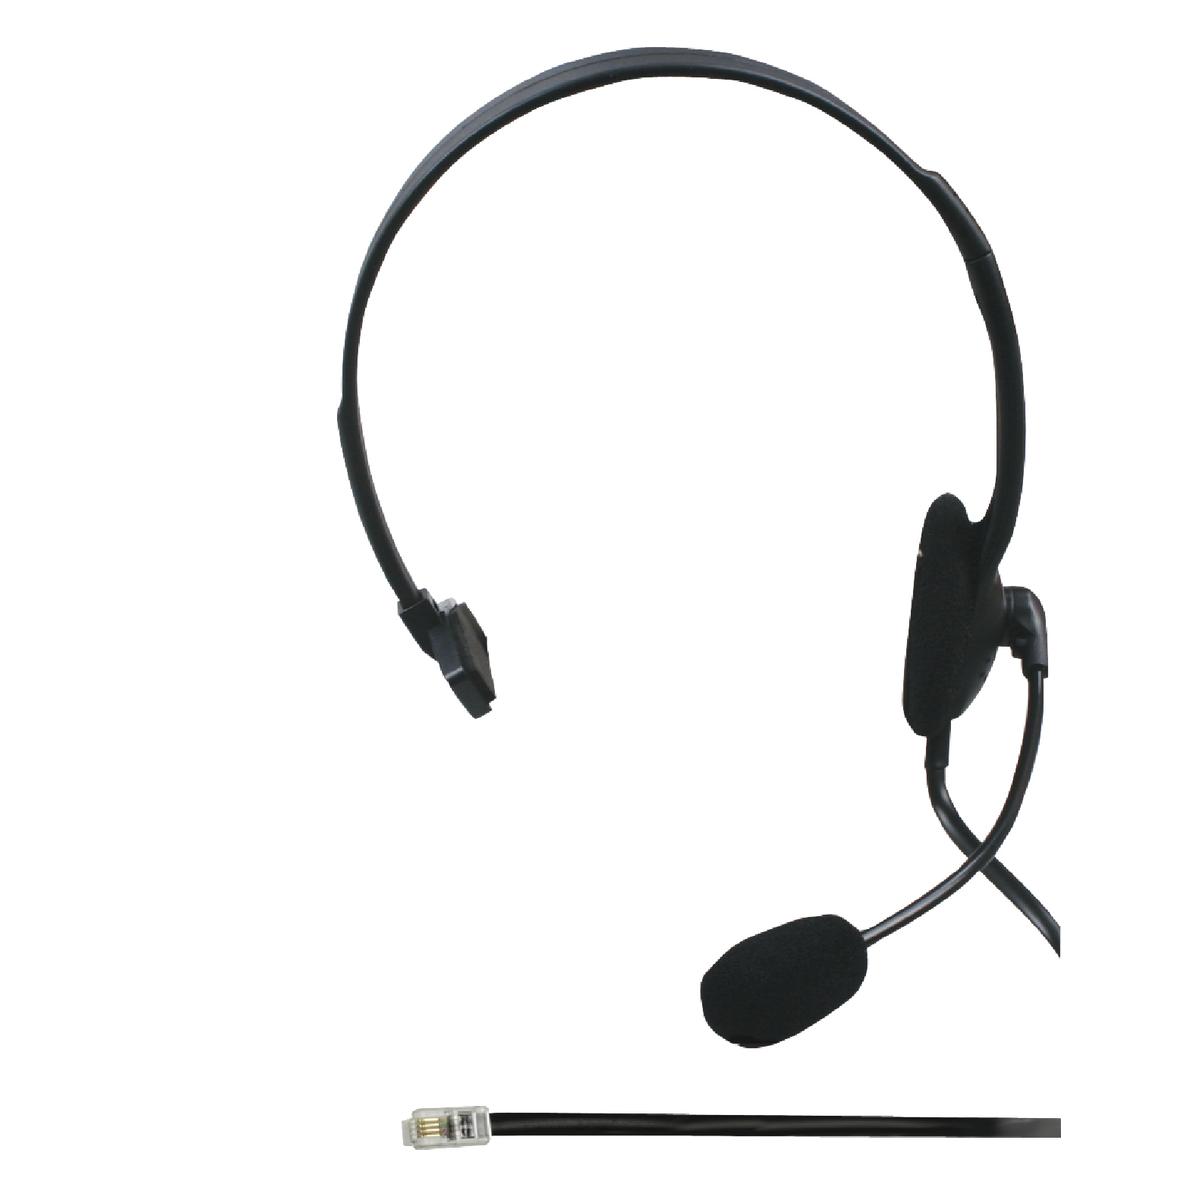 Cmp Headset28